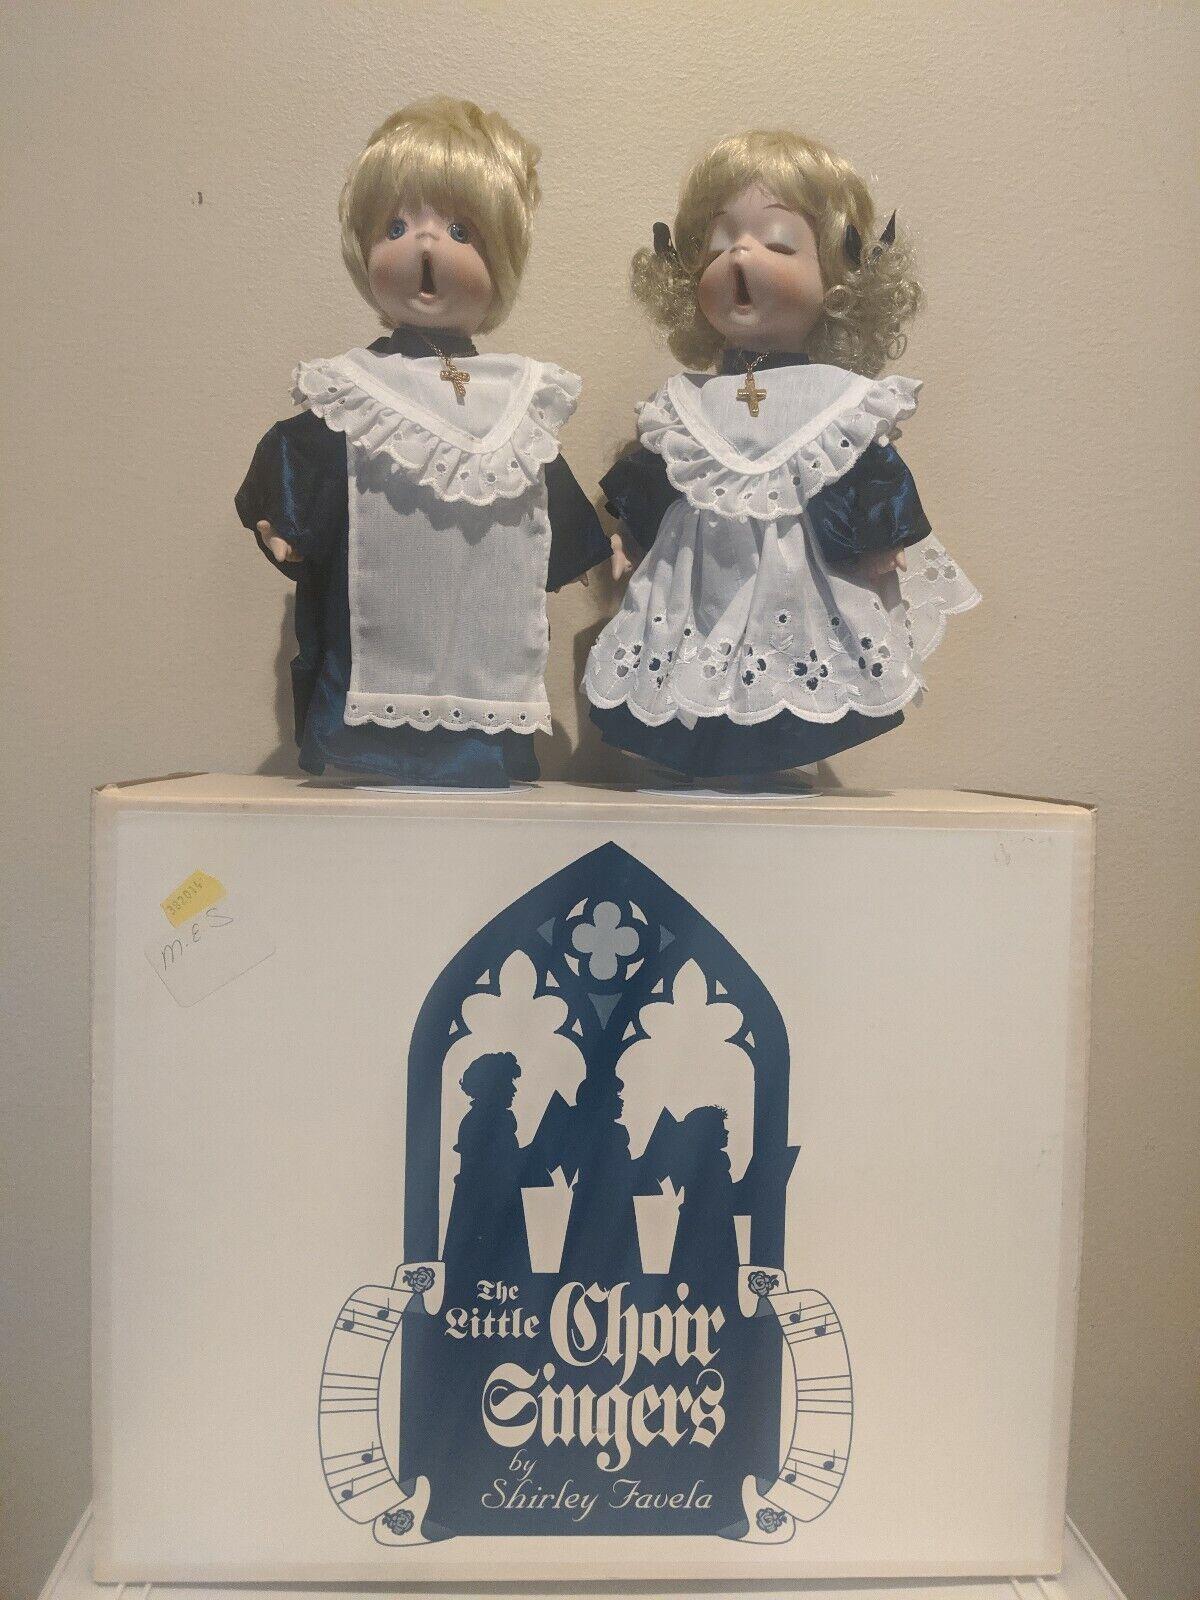 The klein Choir Singers Dolls By Shirley Favela Porcelain Dolls  205 of 2000